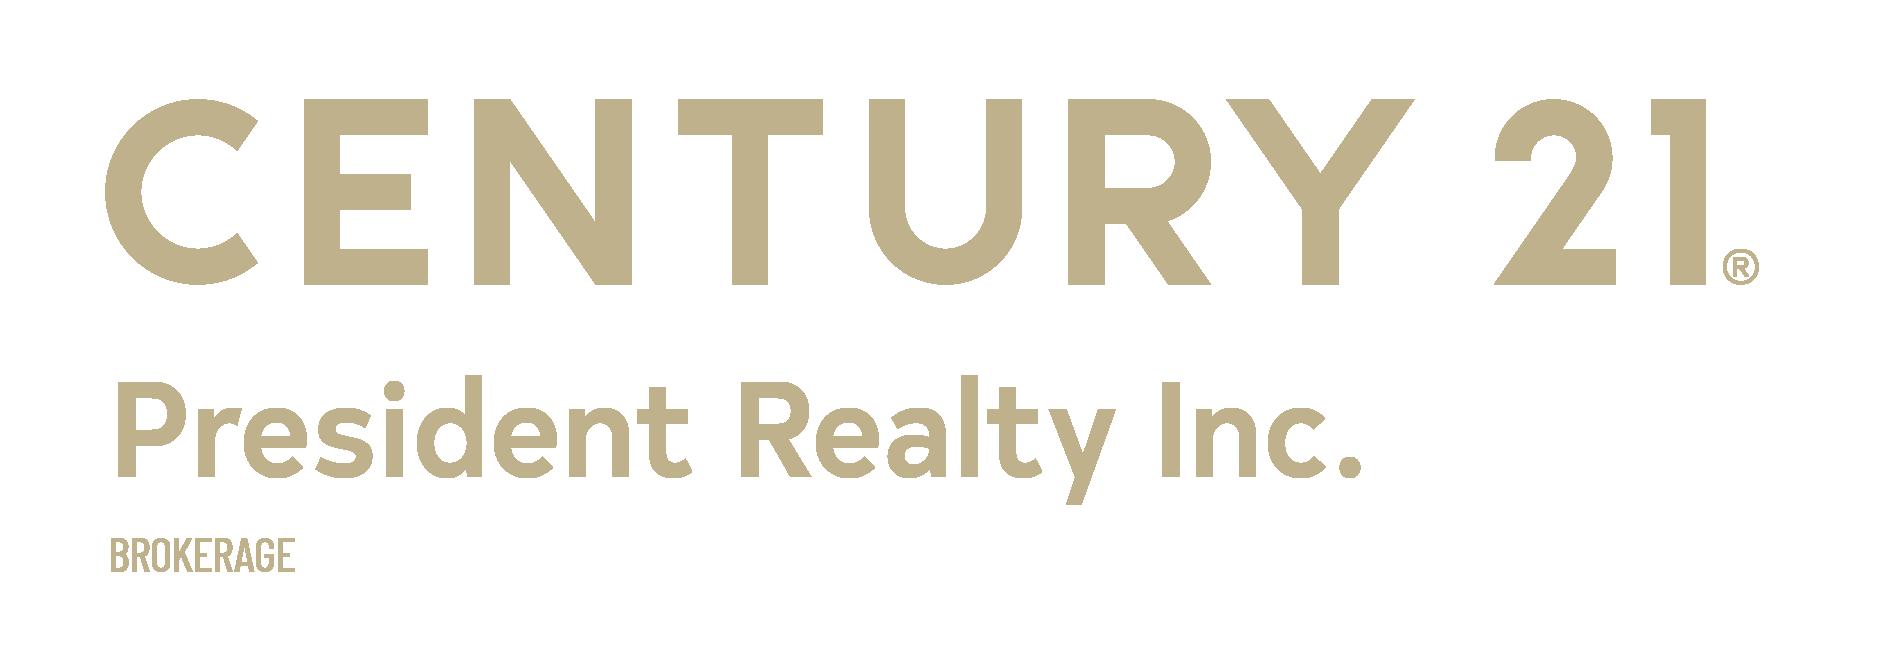 Century 21 President Realty